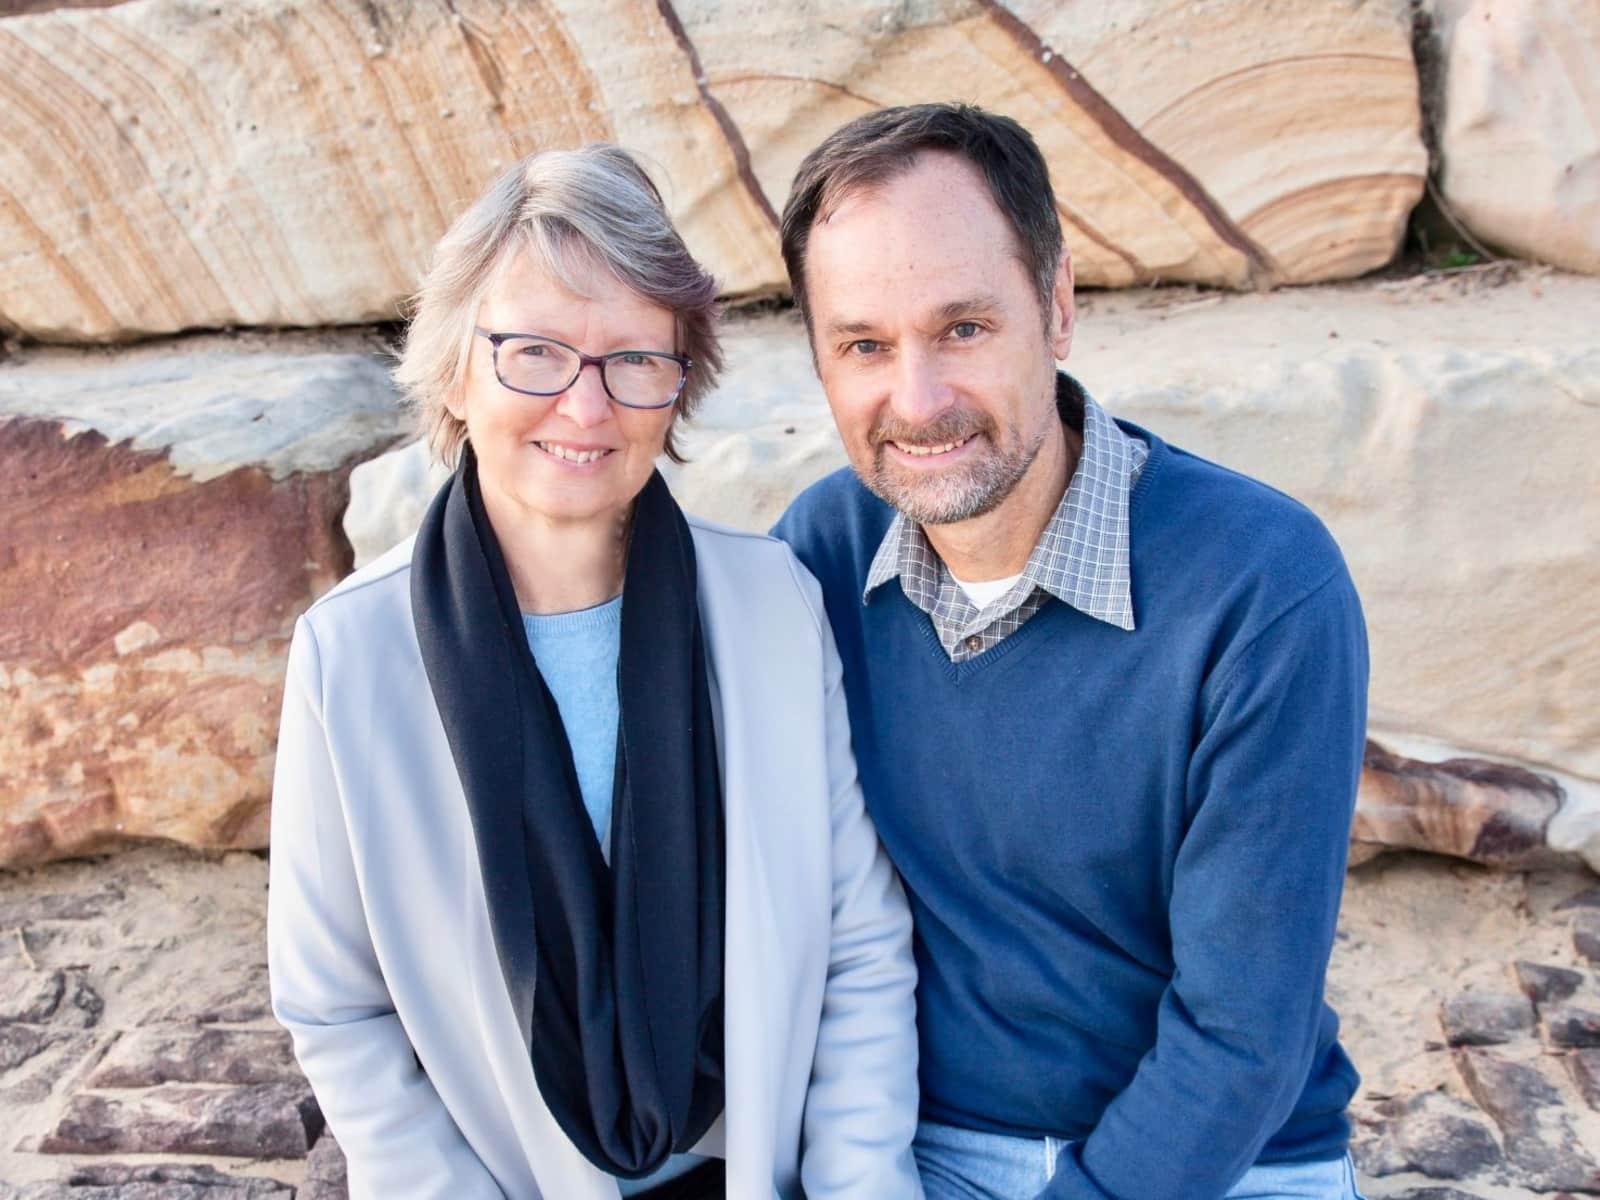 Karen jane & Dale from Terrigal, New South Wales, Australia